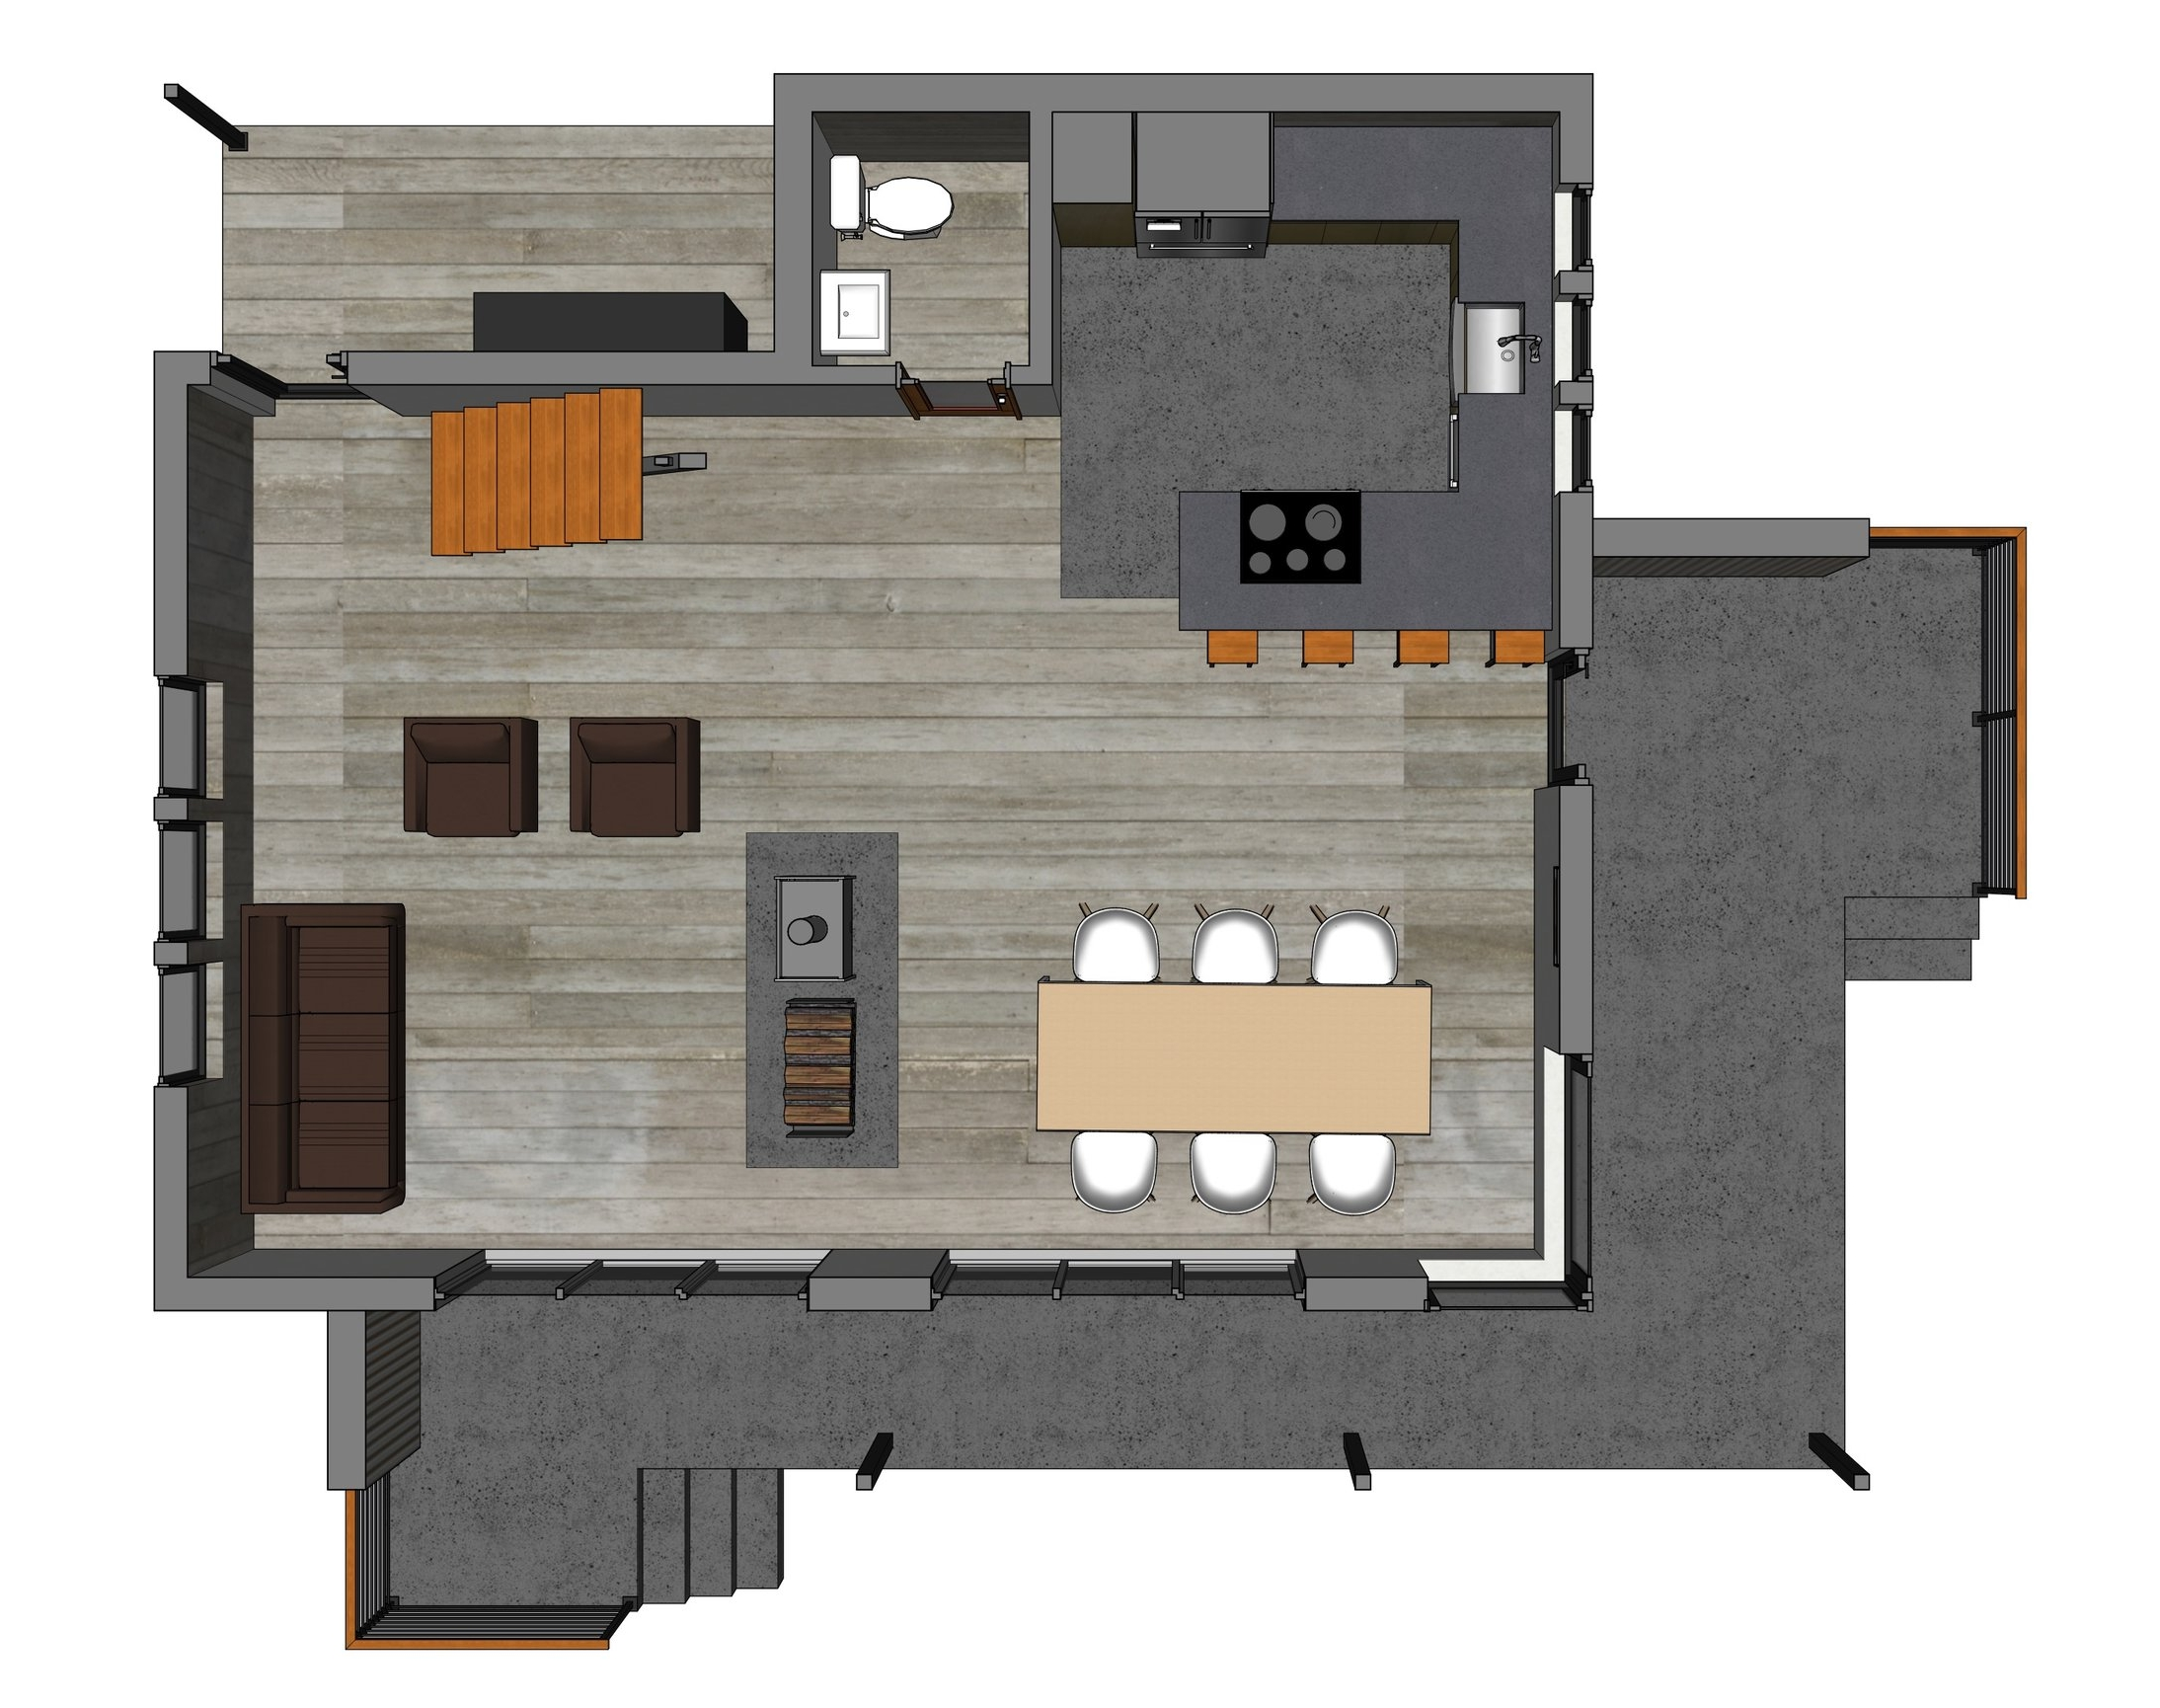 Mountain_house_floorplan_color.jpg.jpg